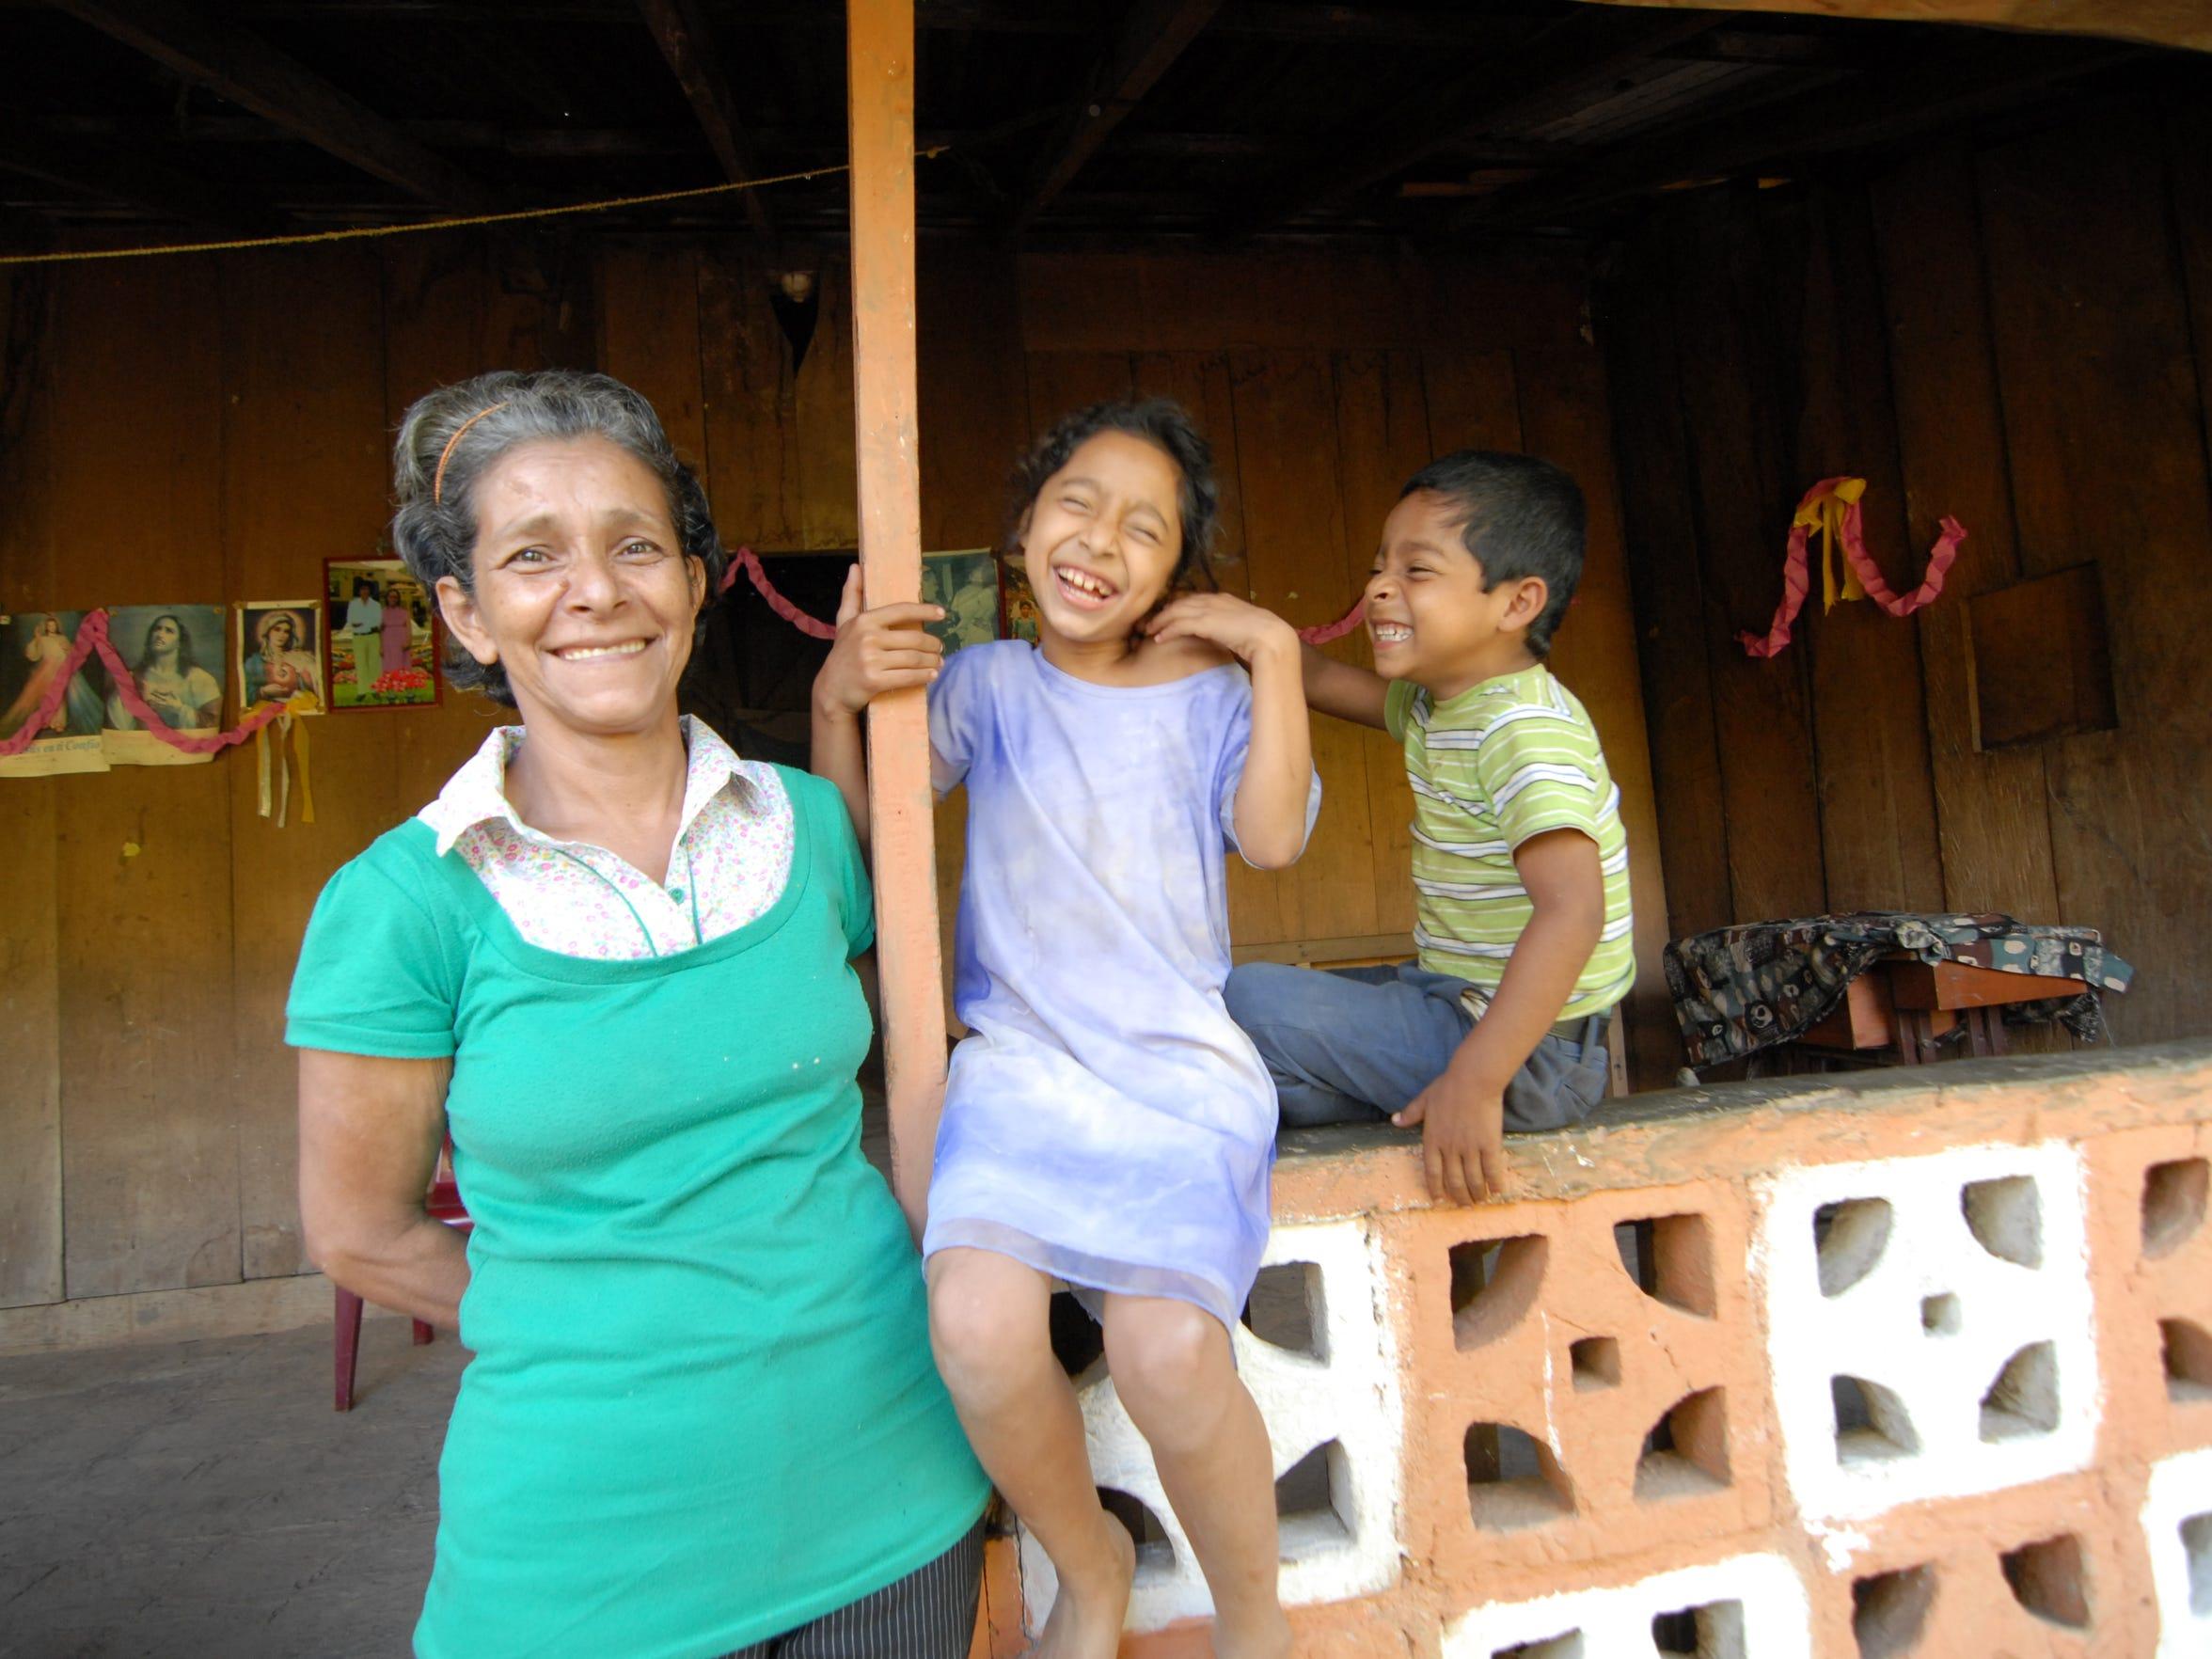 Anunciacion and her grandchildren, Alfoncina and Fernando, outside their home.